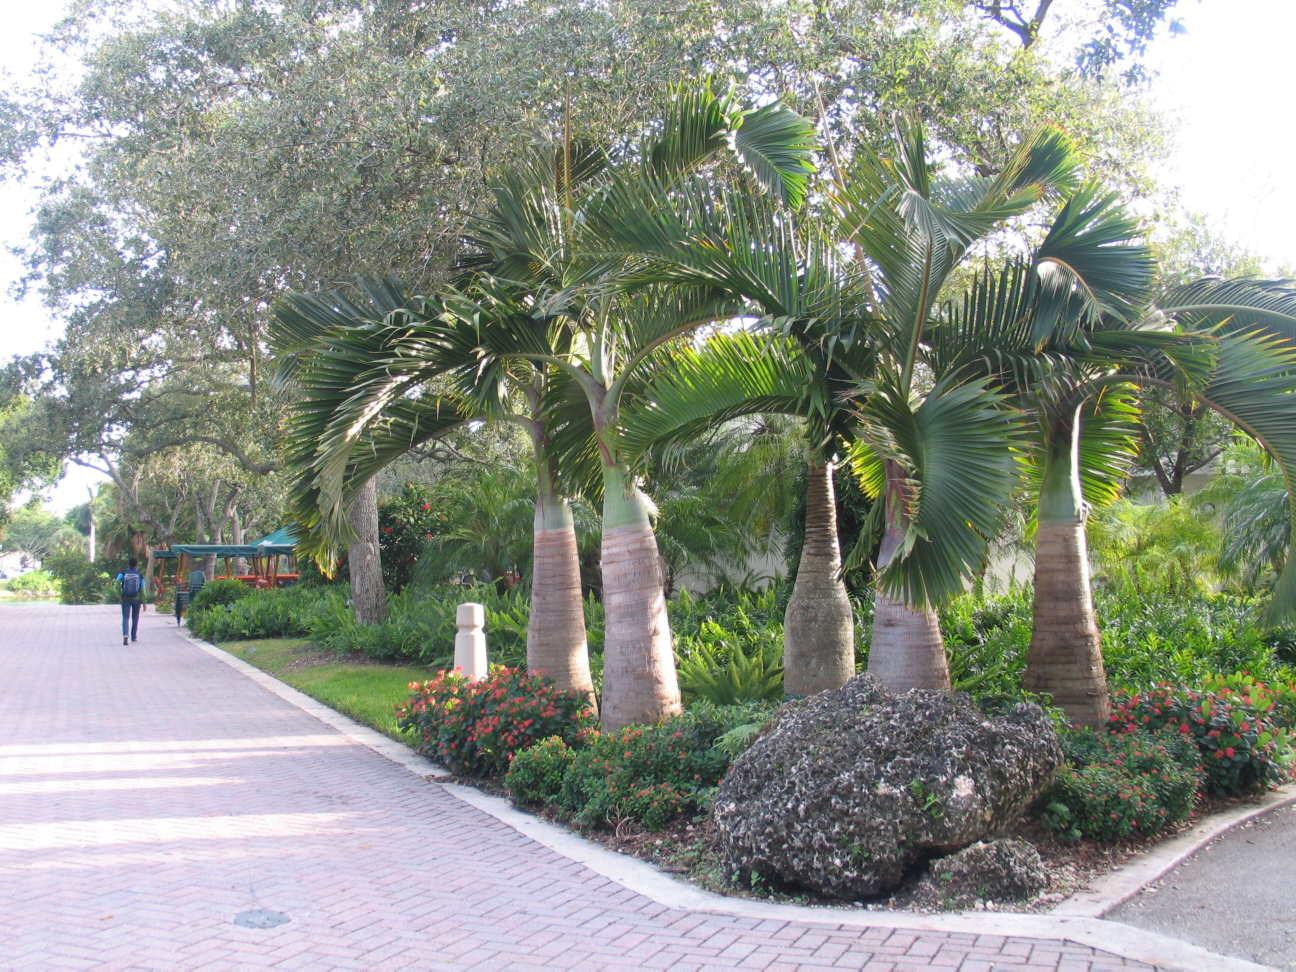 Bottle Palms